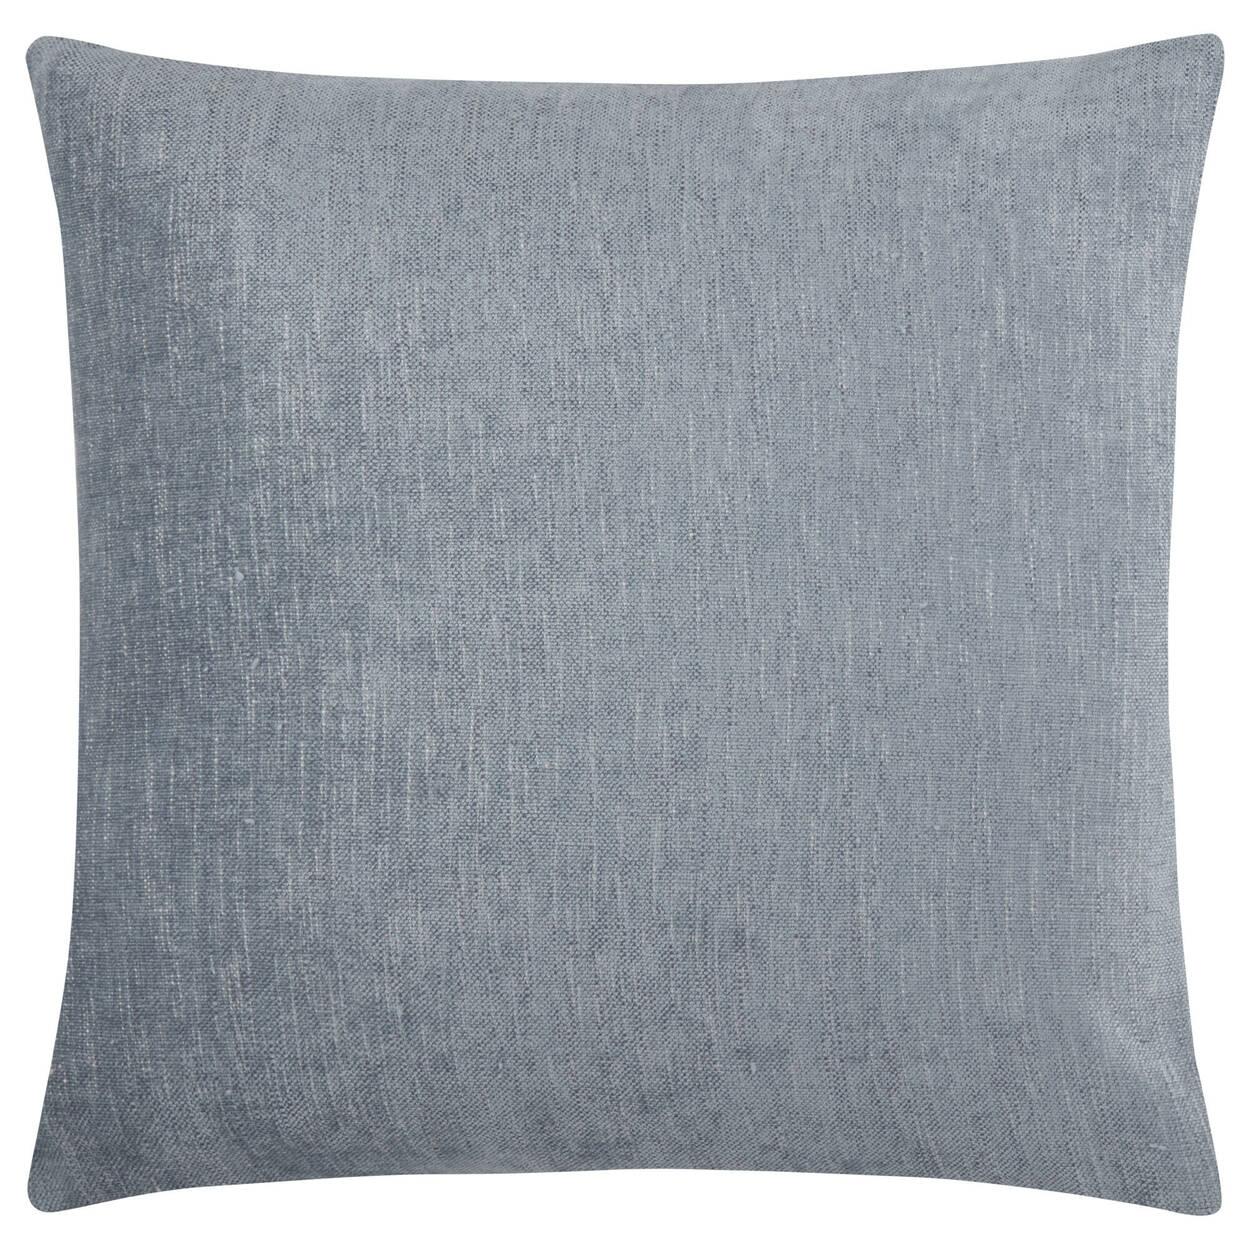 "Gael Decorative Pillow 19"" X 19"""